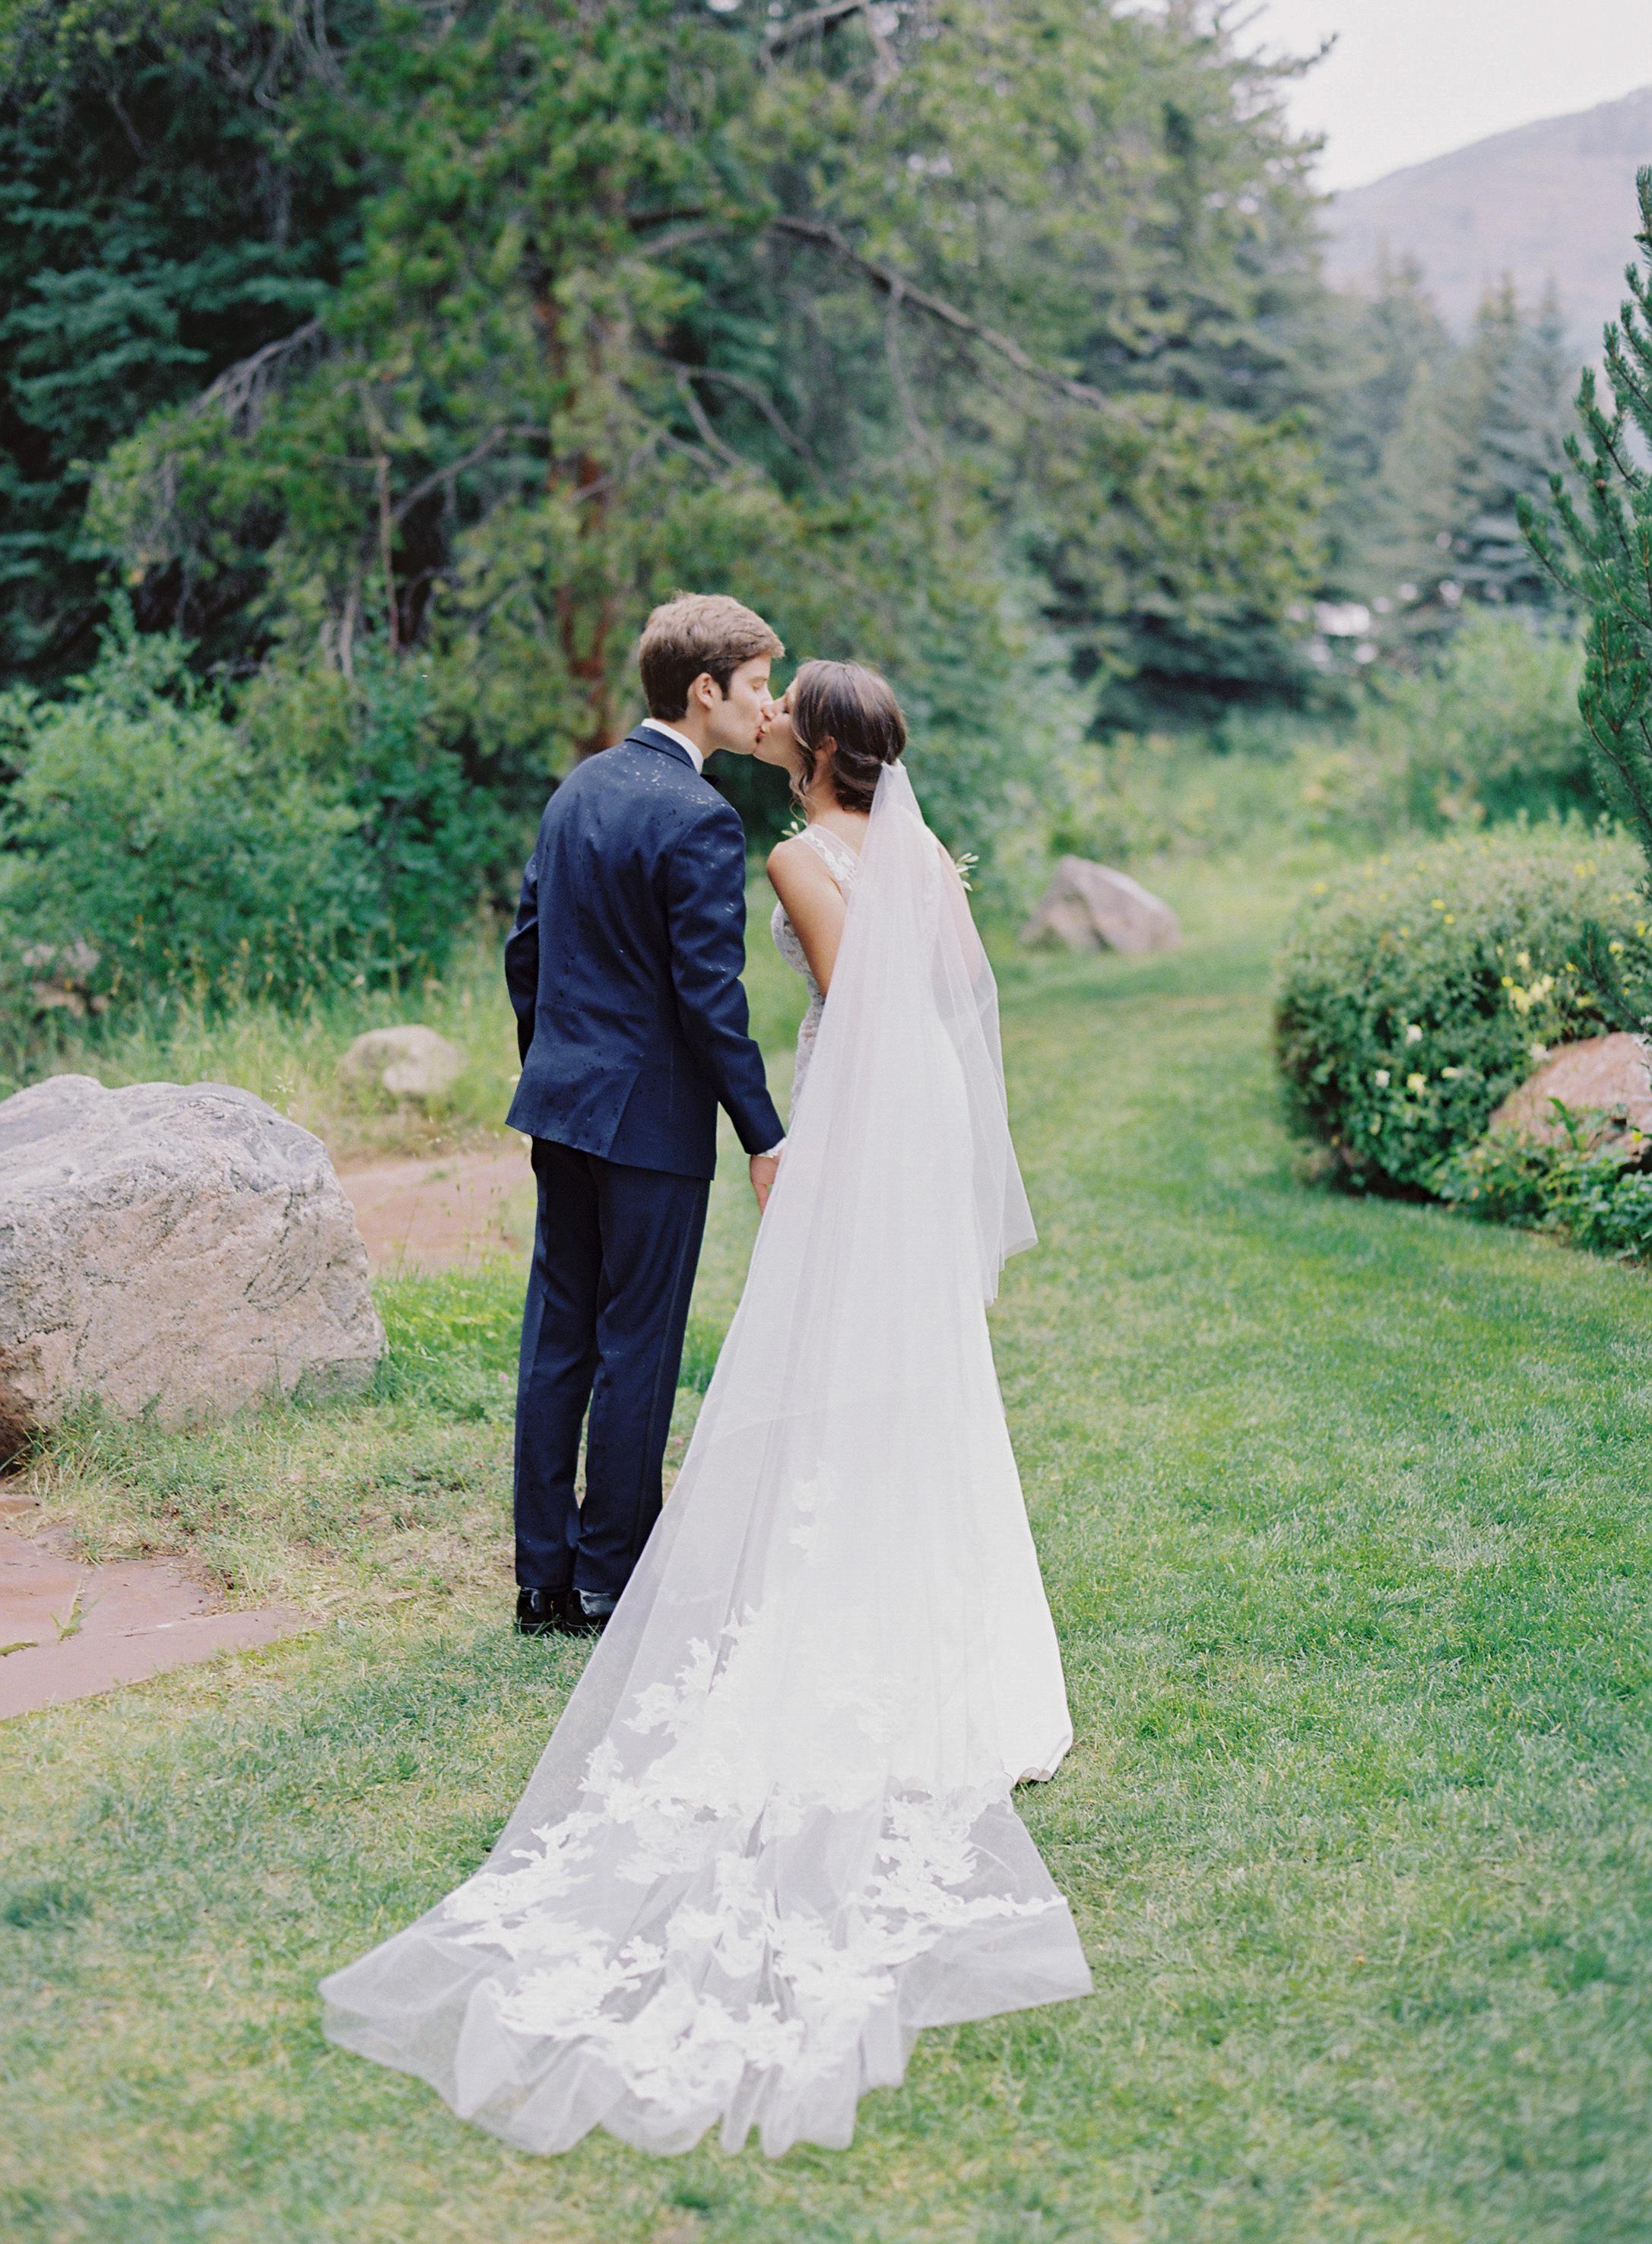 Vail Colorado Wedding Day-Carrie King Photographer-445.jpg